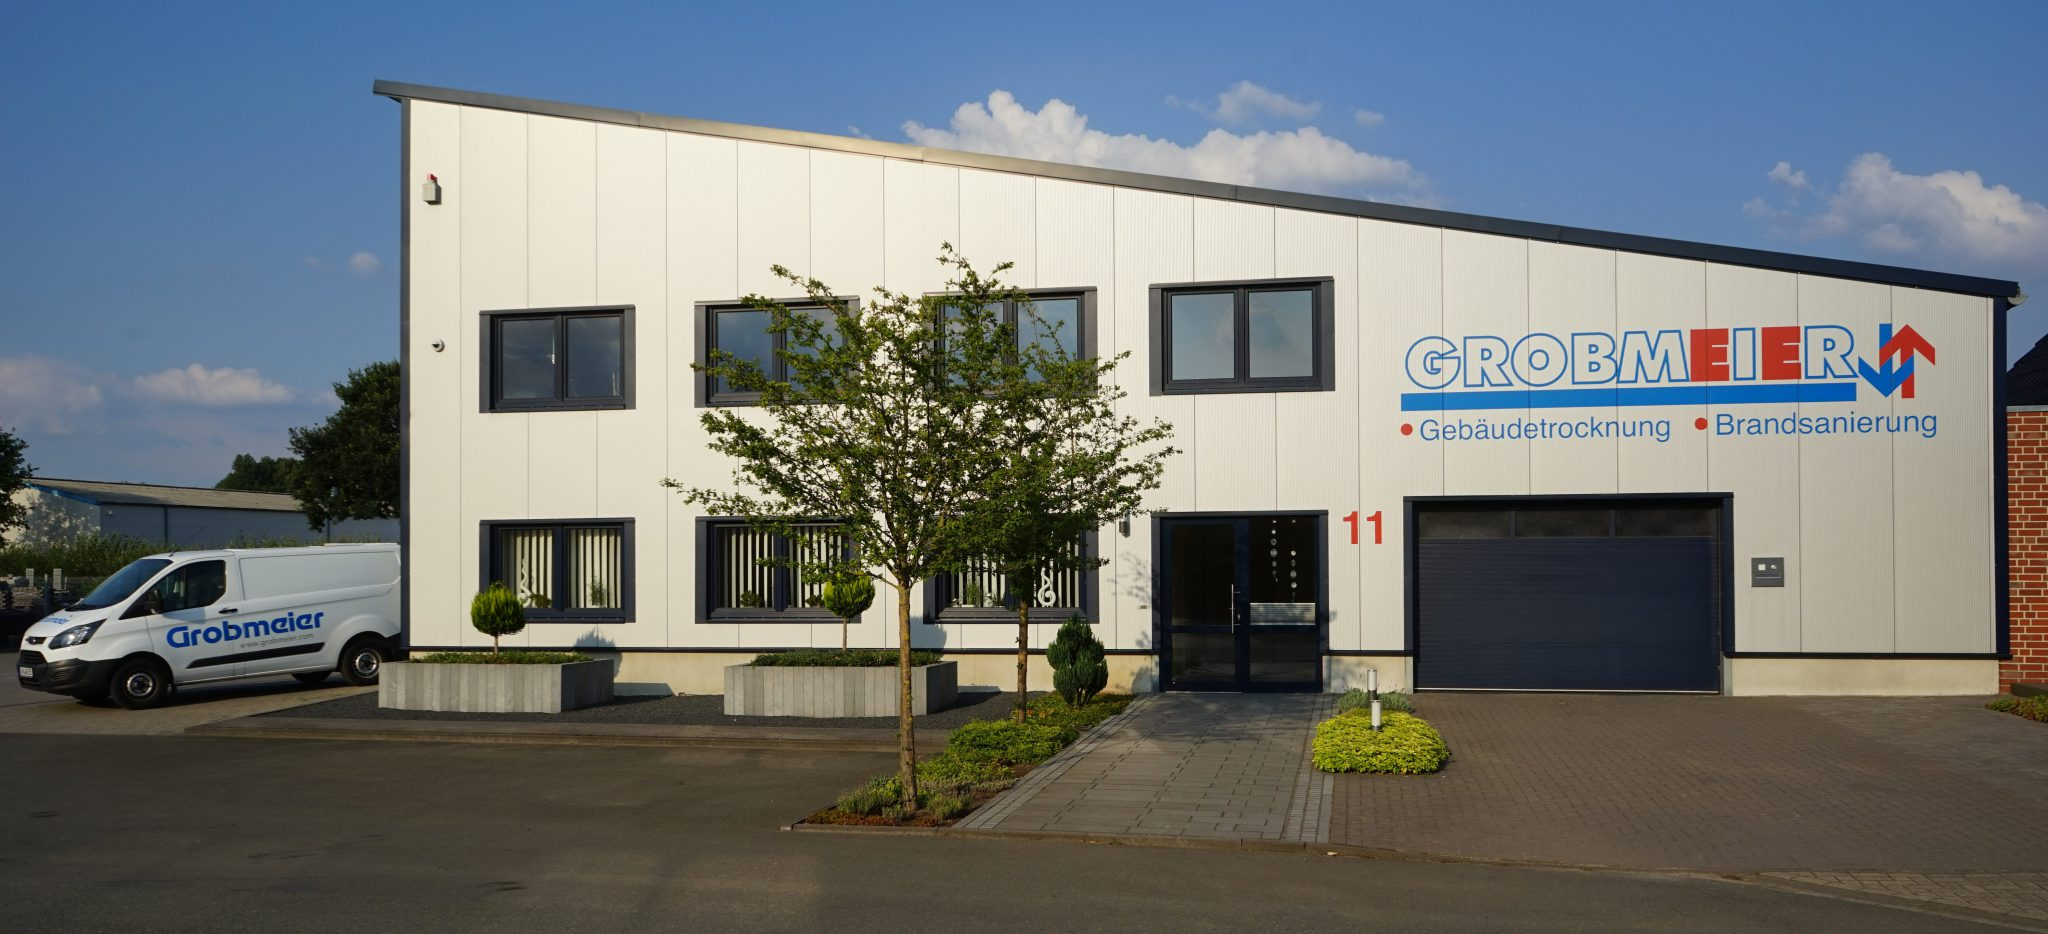 Grobmeier_Firma